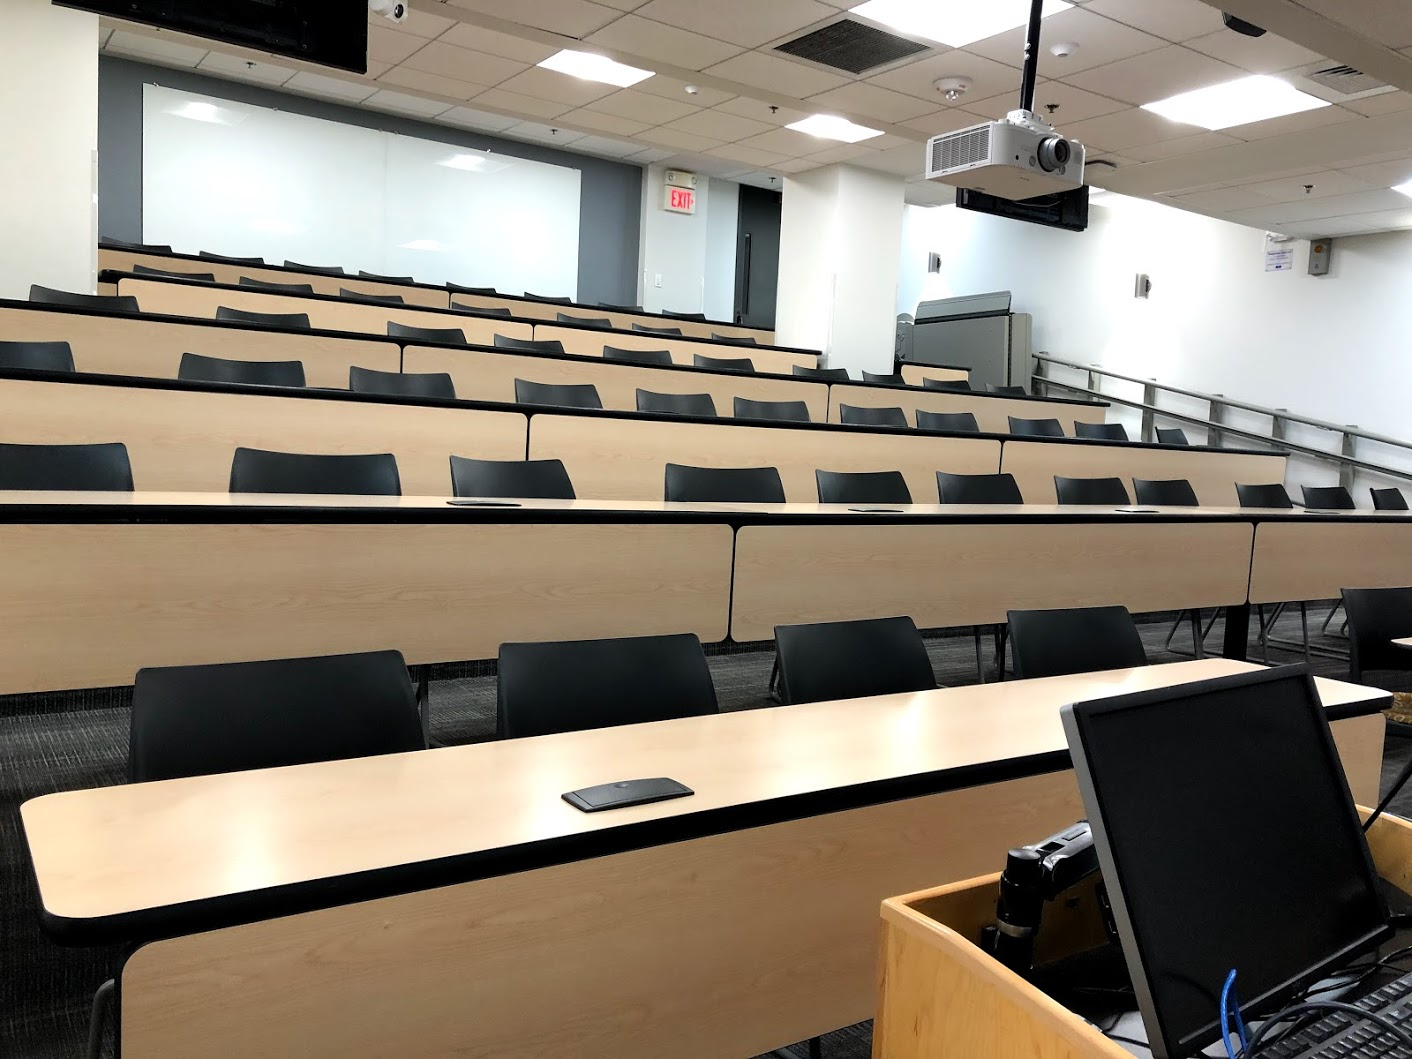 Cabot classroom